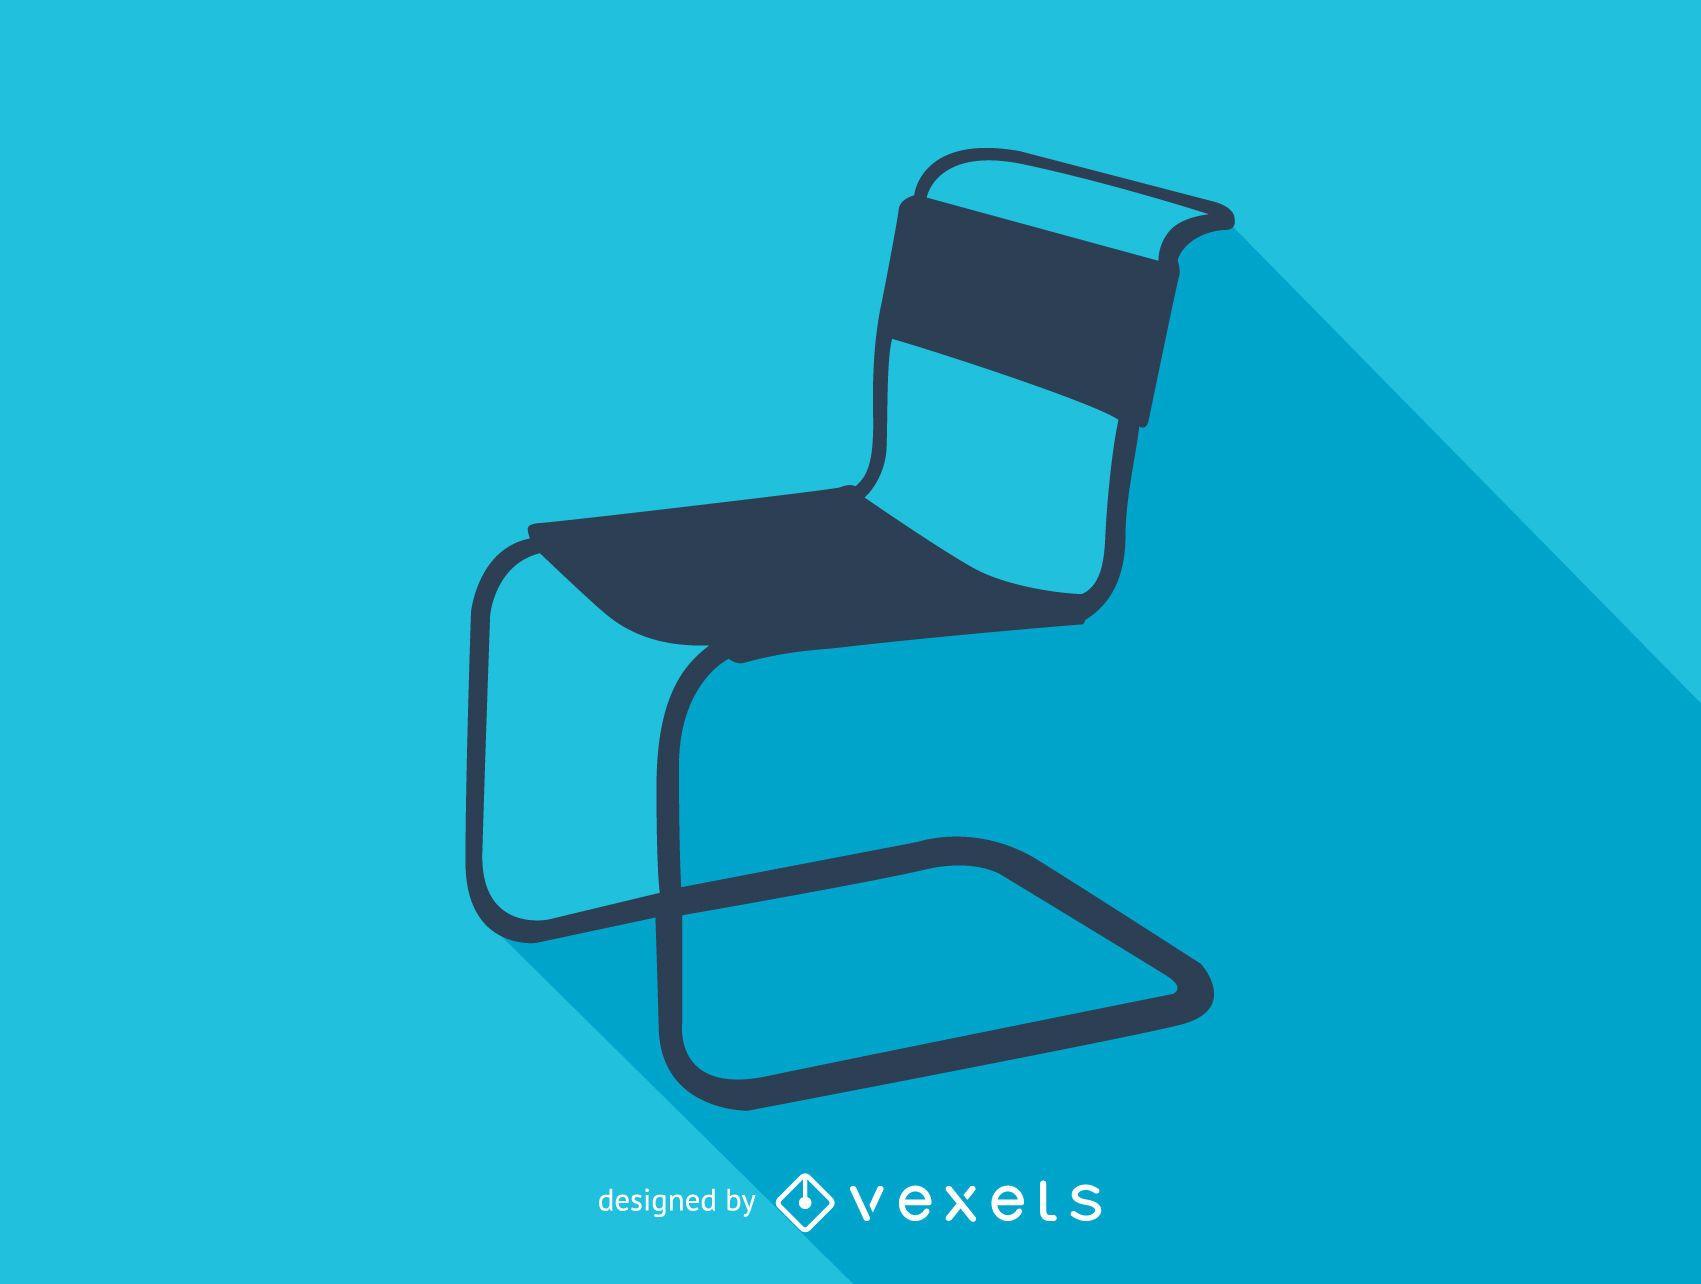 Marcel Breuer Spoleto chair silhouette